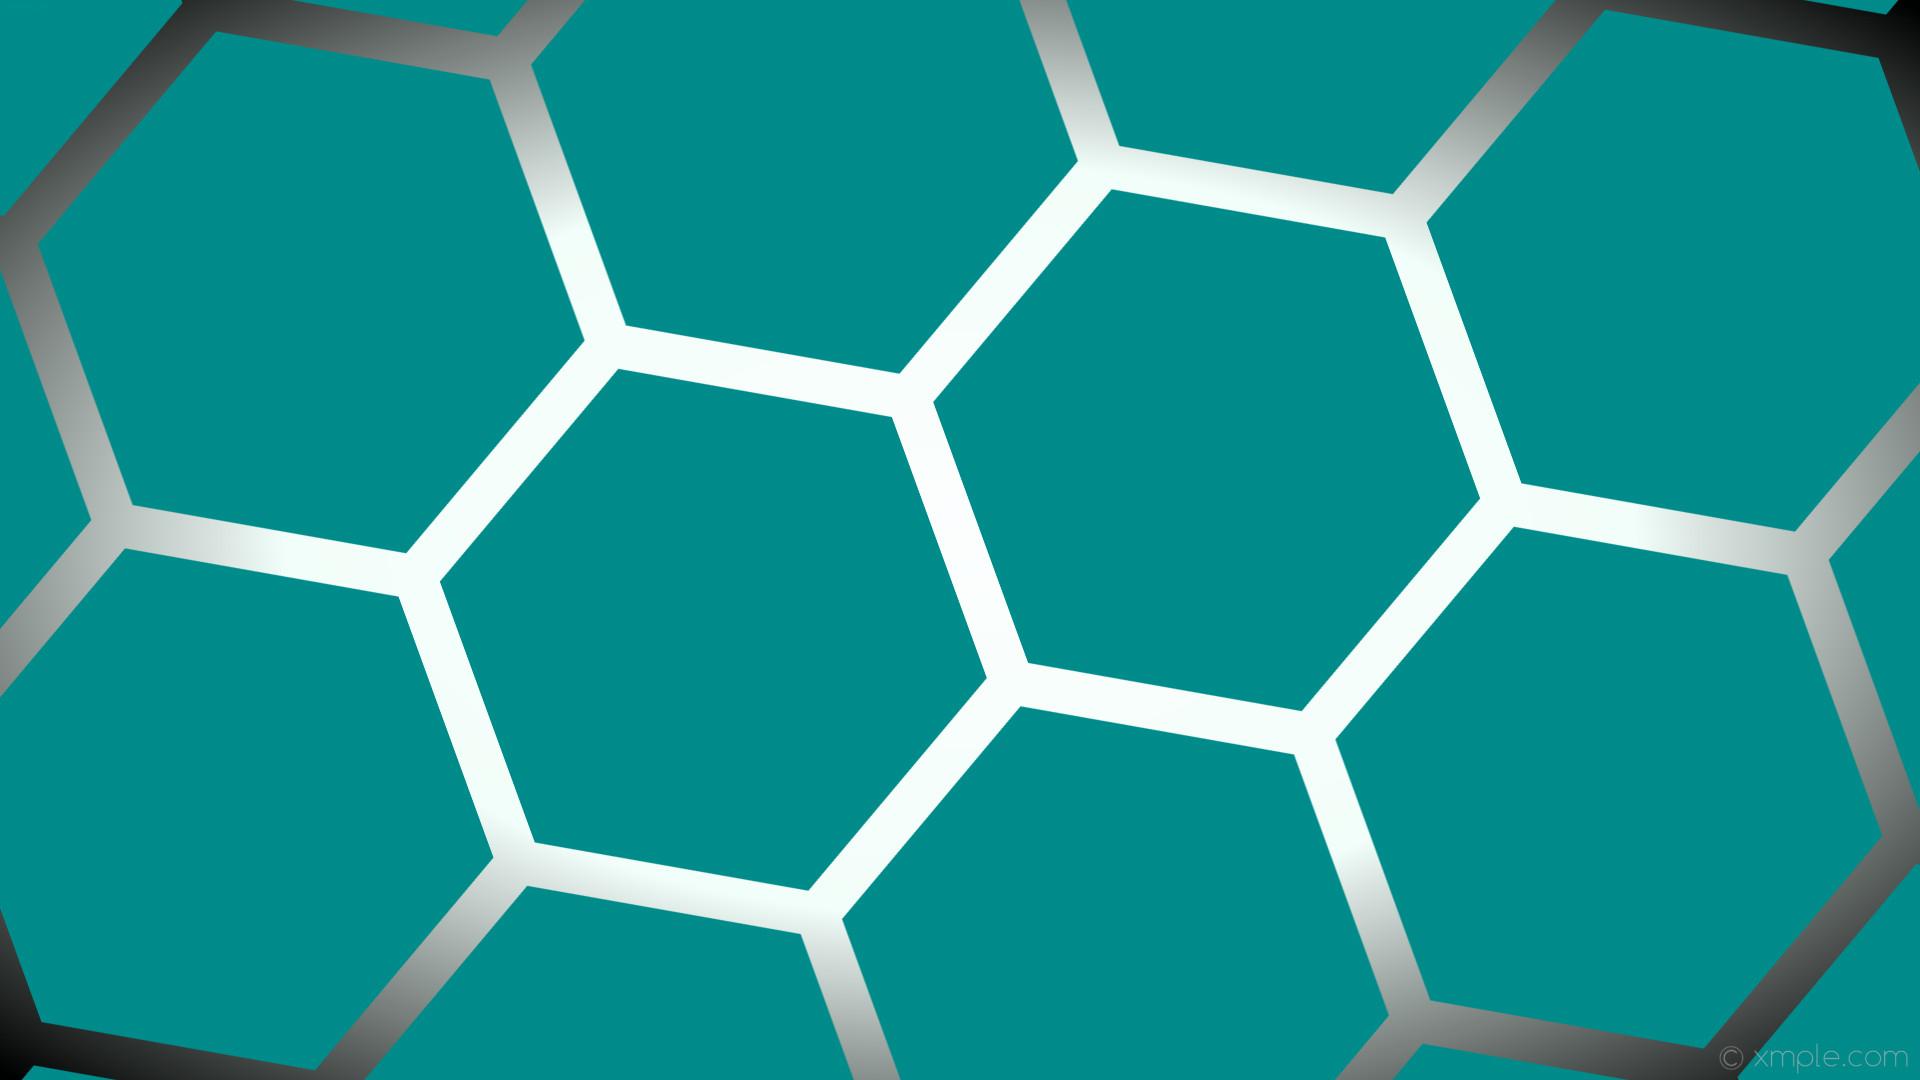 wallpaper glow hexagon white green gradient black dark cyan mint cream  #008b8b #ffffff #